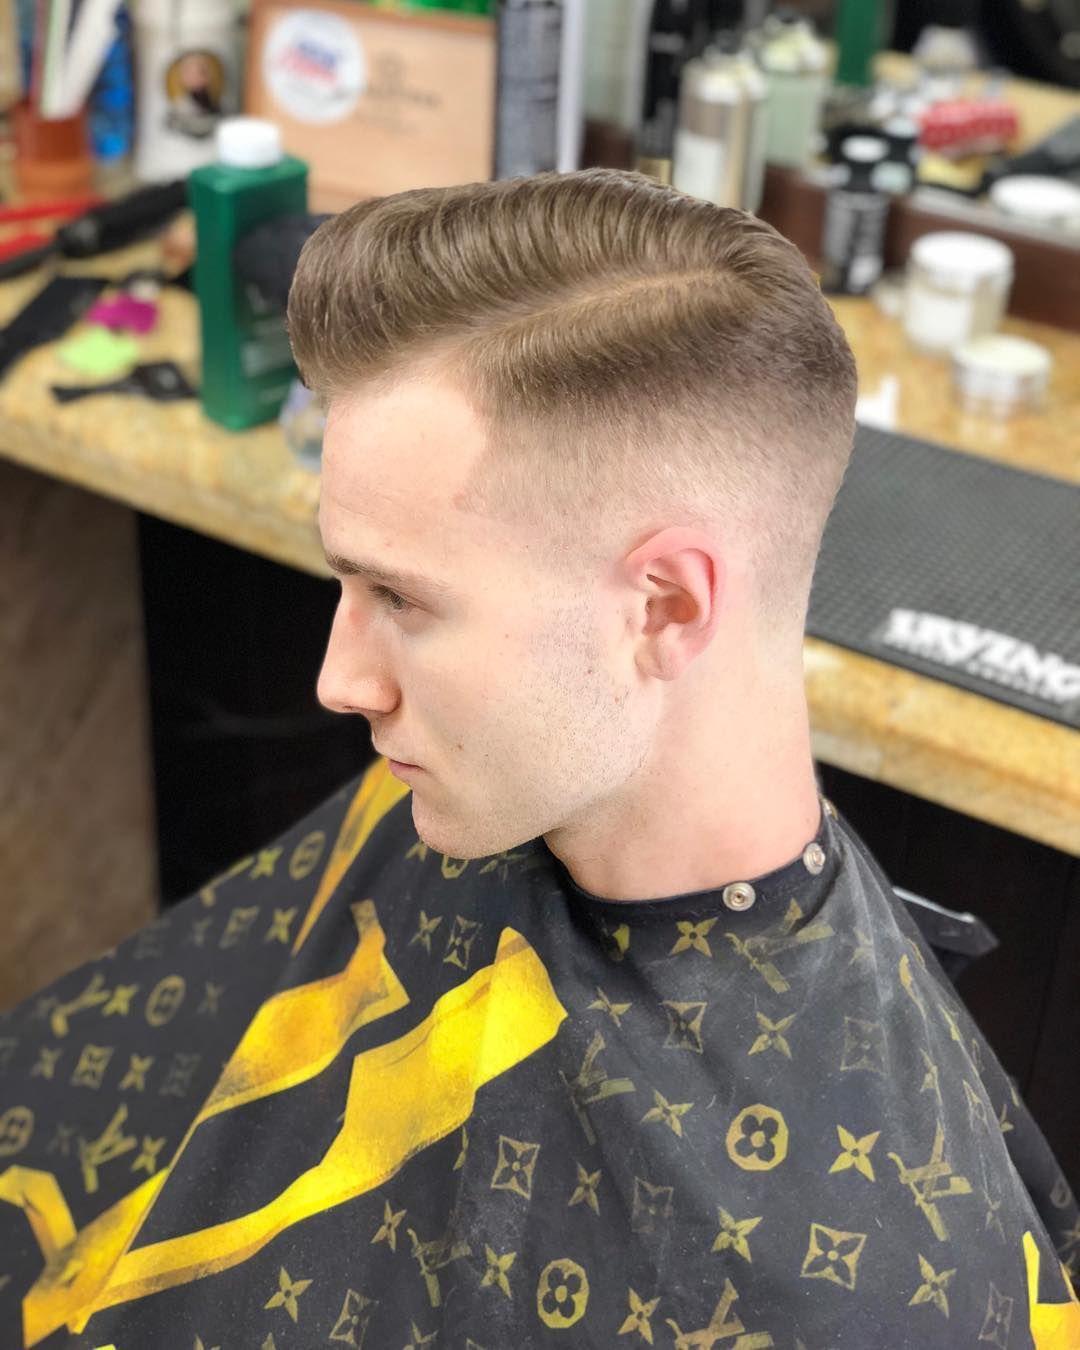 X men haircut labarberiaalcoy tubarberiaenalcoy nosomosfranquicia